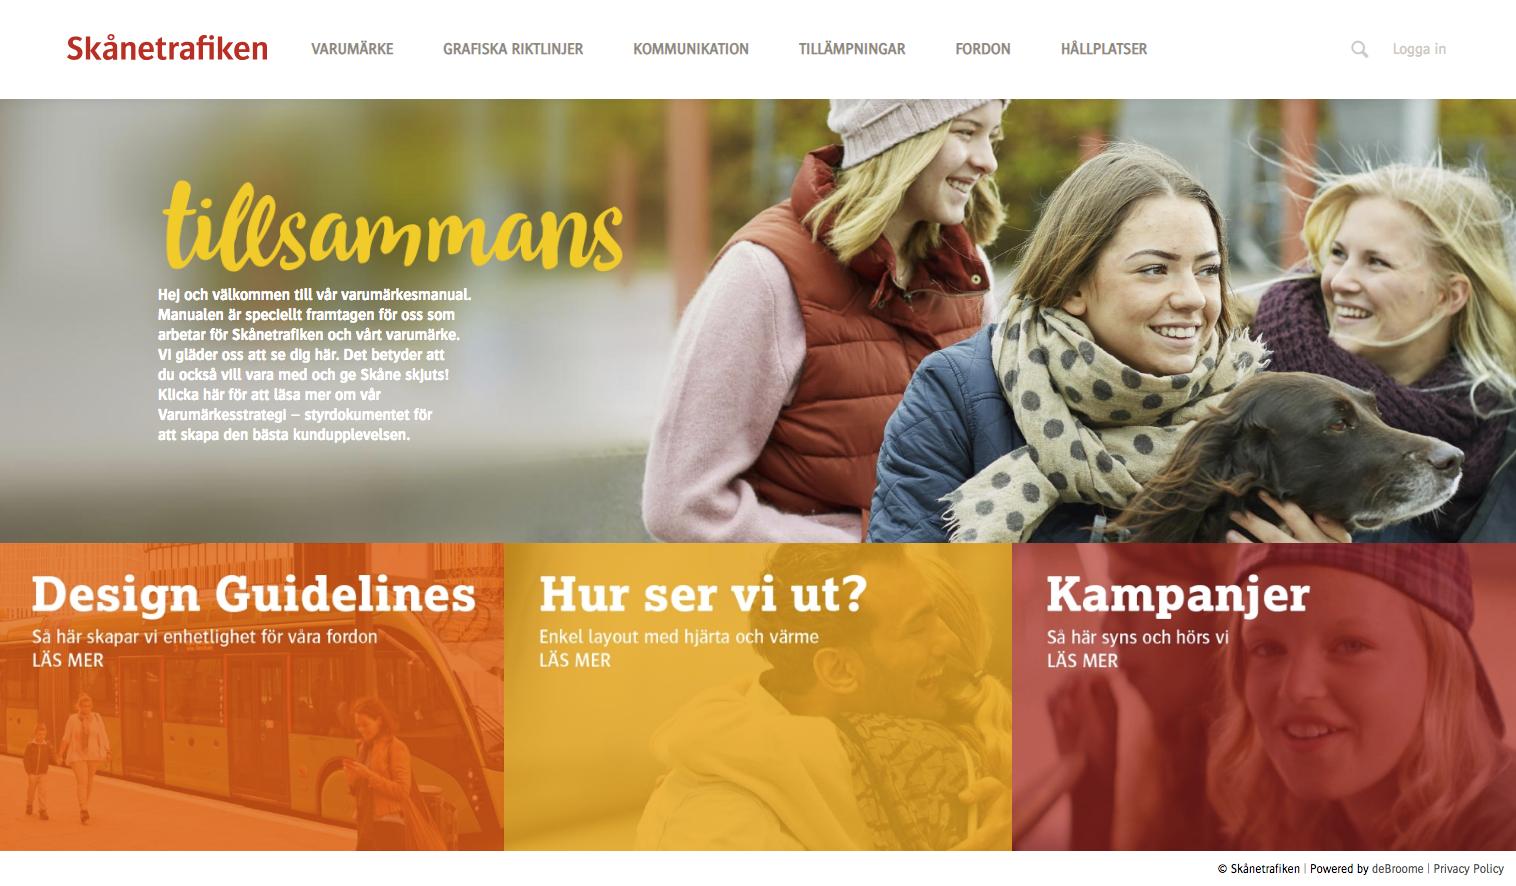 Skanetrafiken homepage with girls smiling